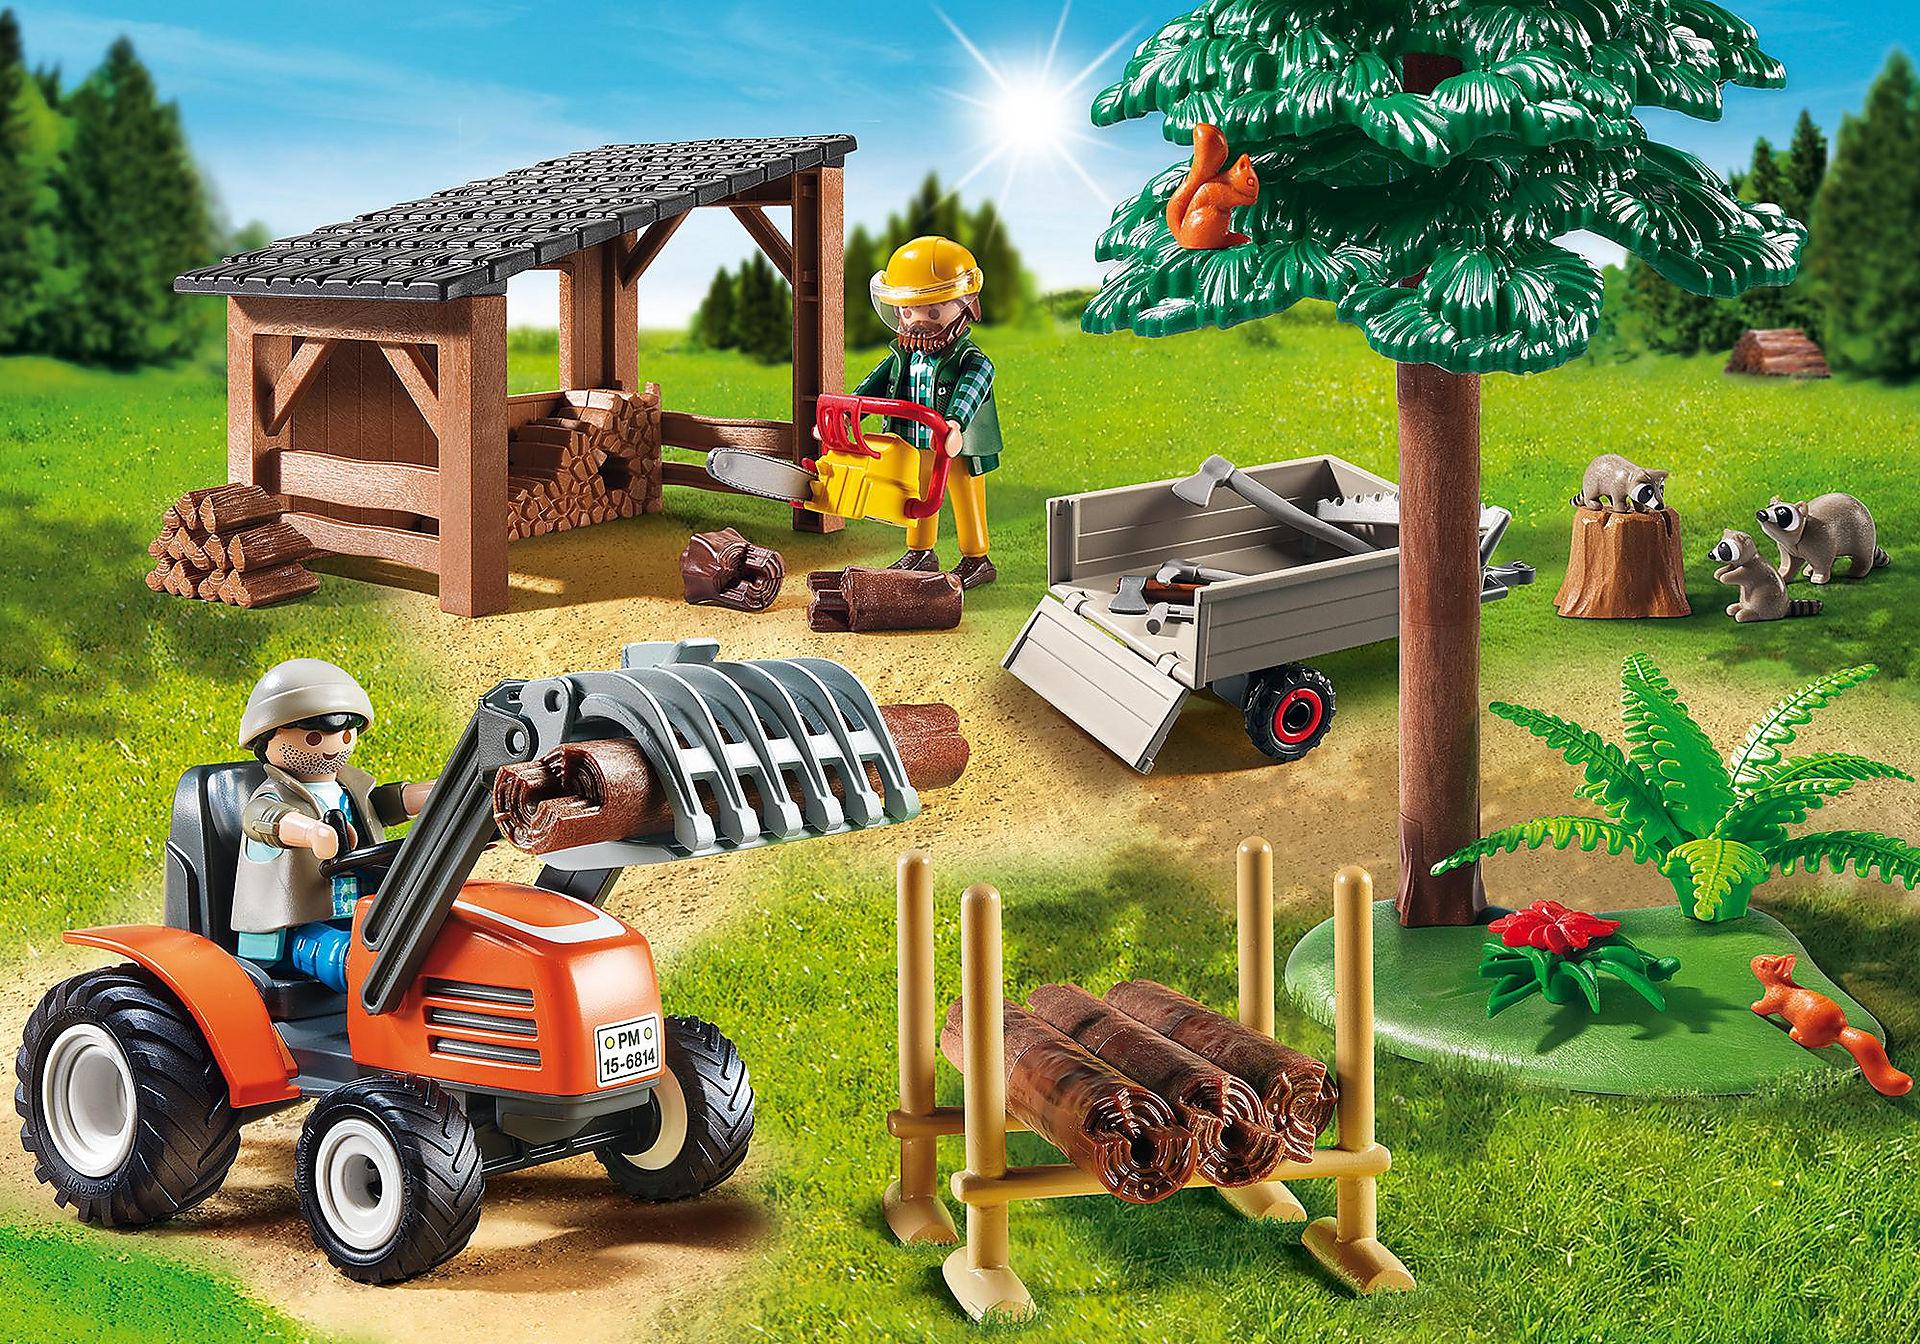 6814 Holzfäller mit Traktor zoom image1